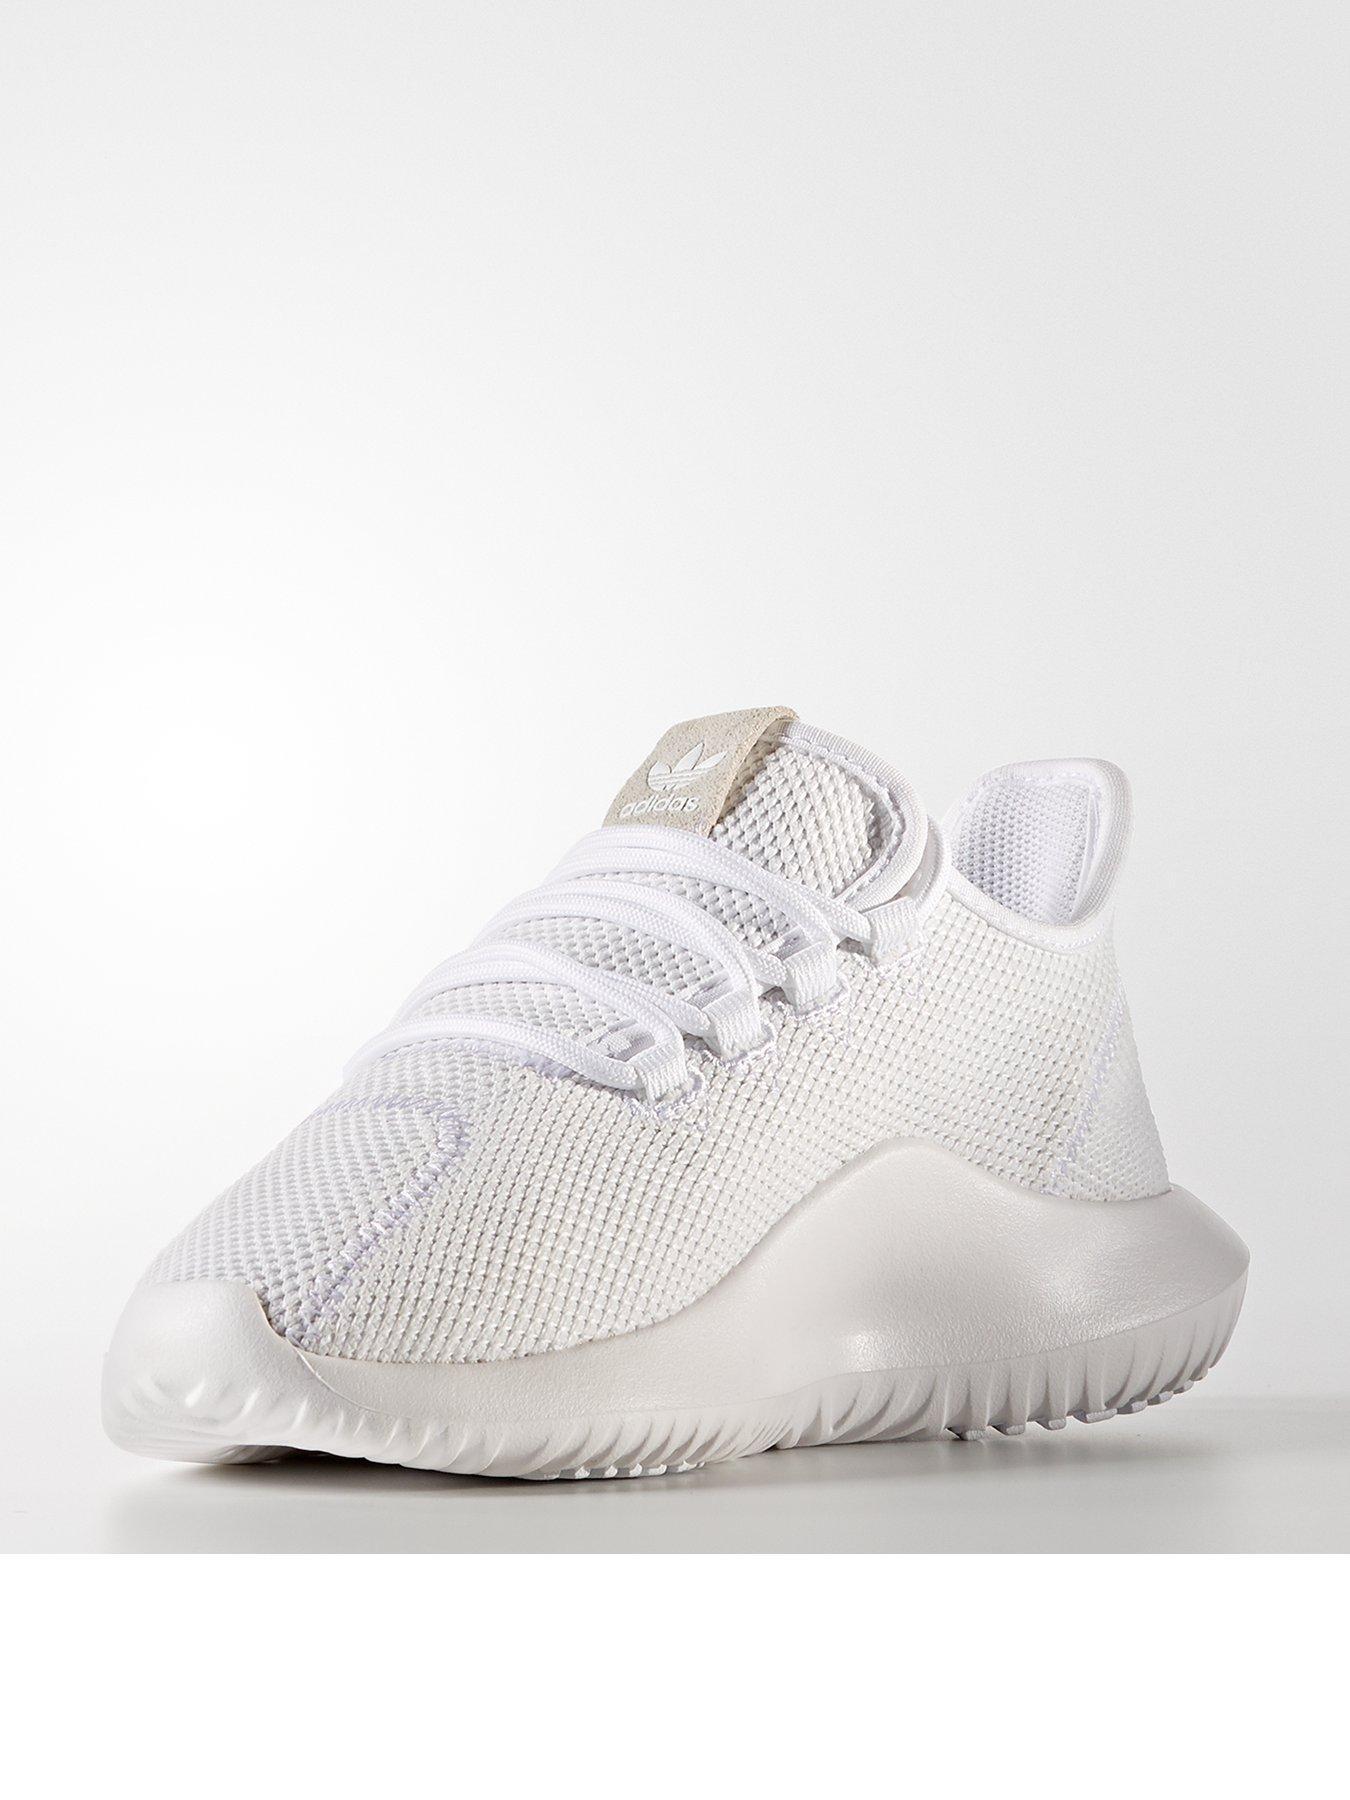 adidas tubular shadow junior white